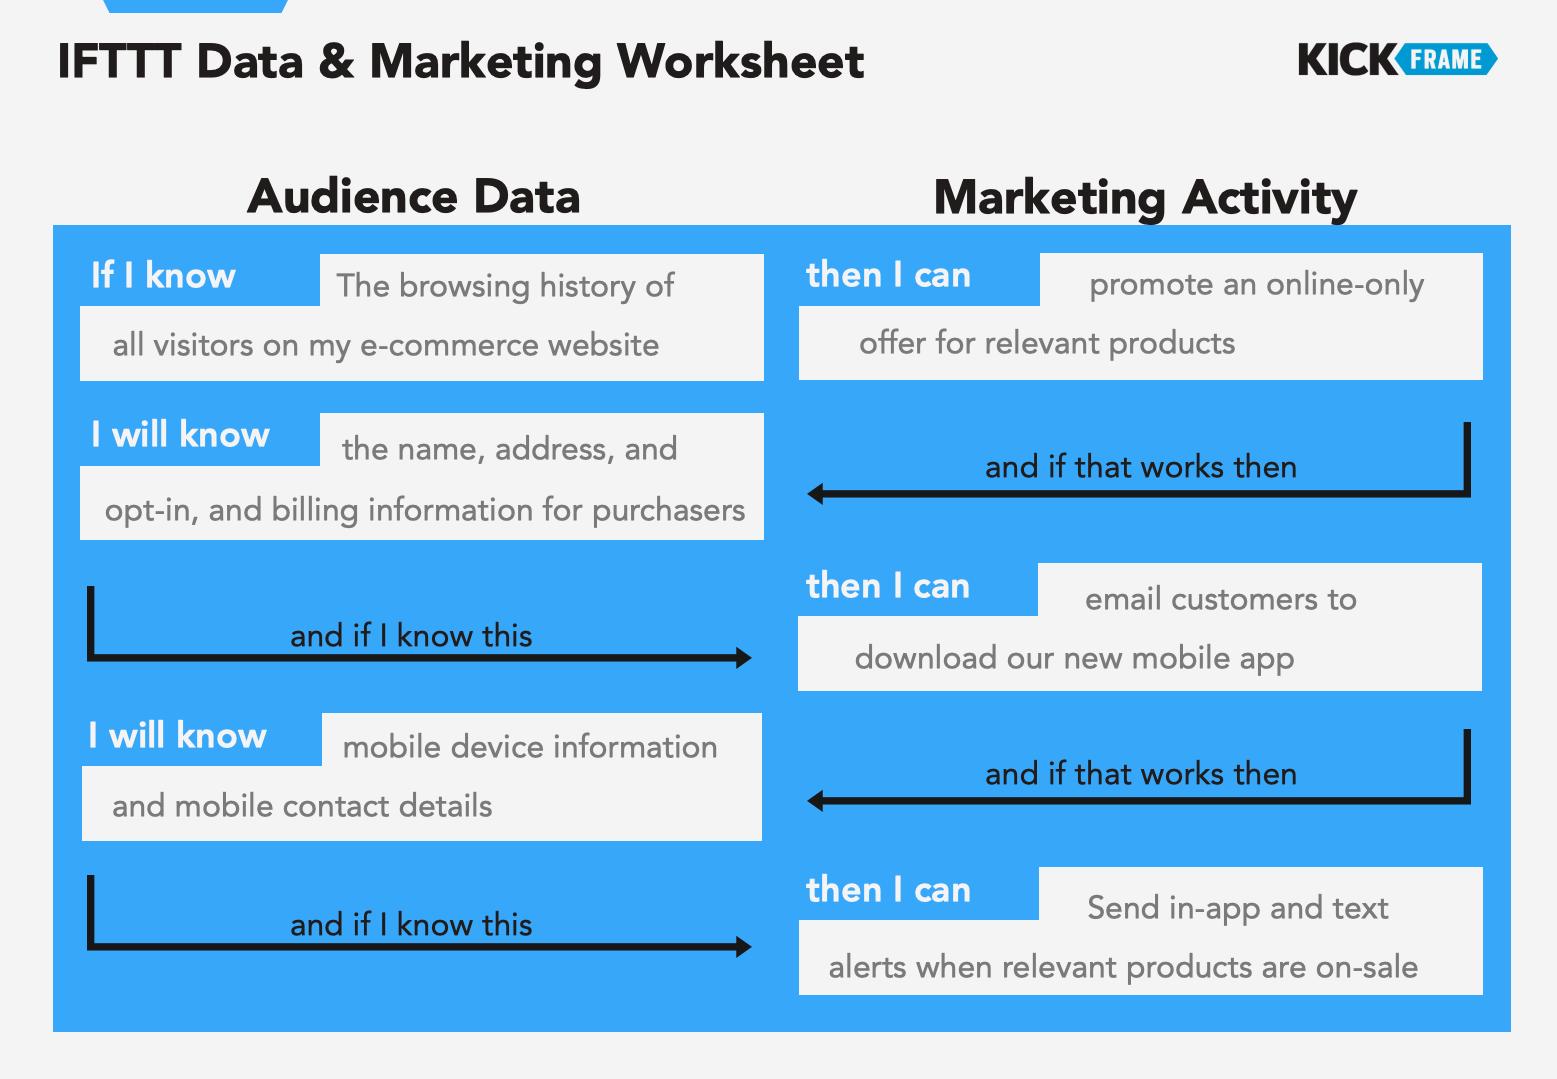 IFTTT Data & Marketing Worksheet_Filled